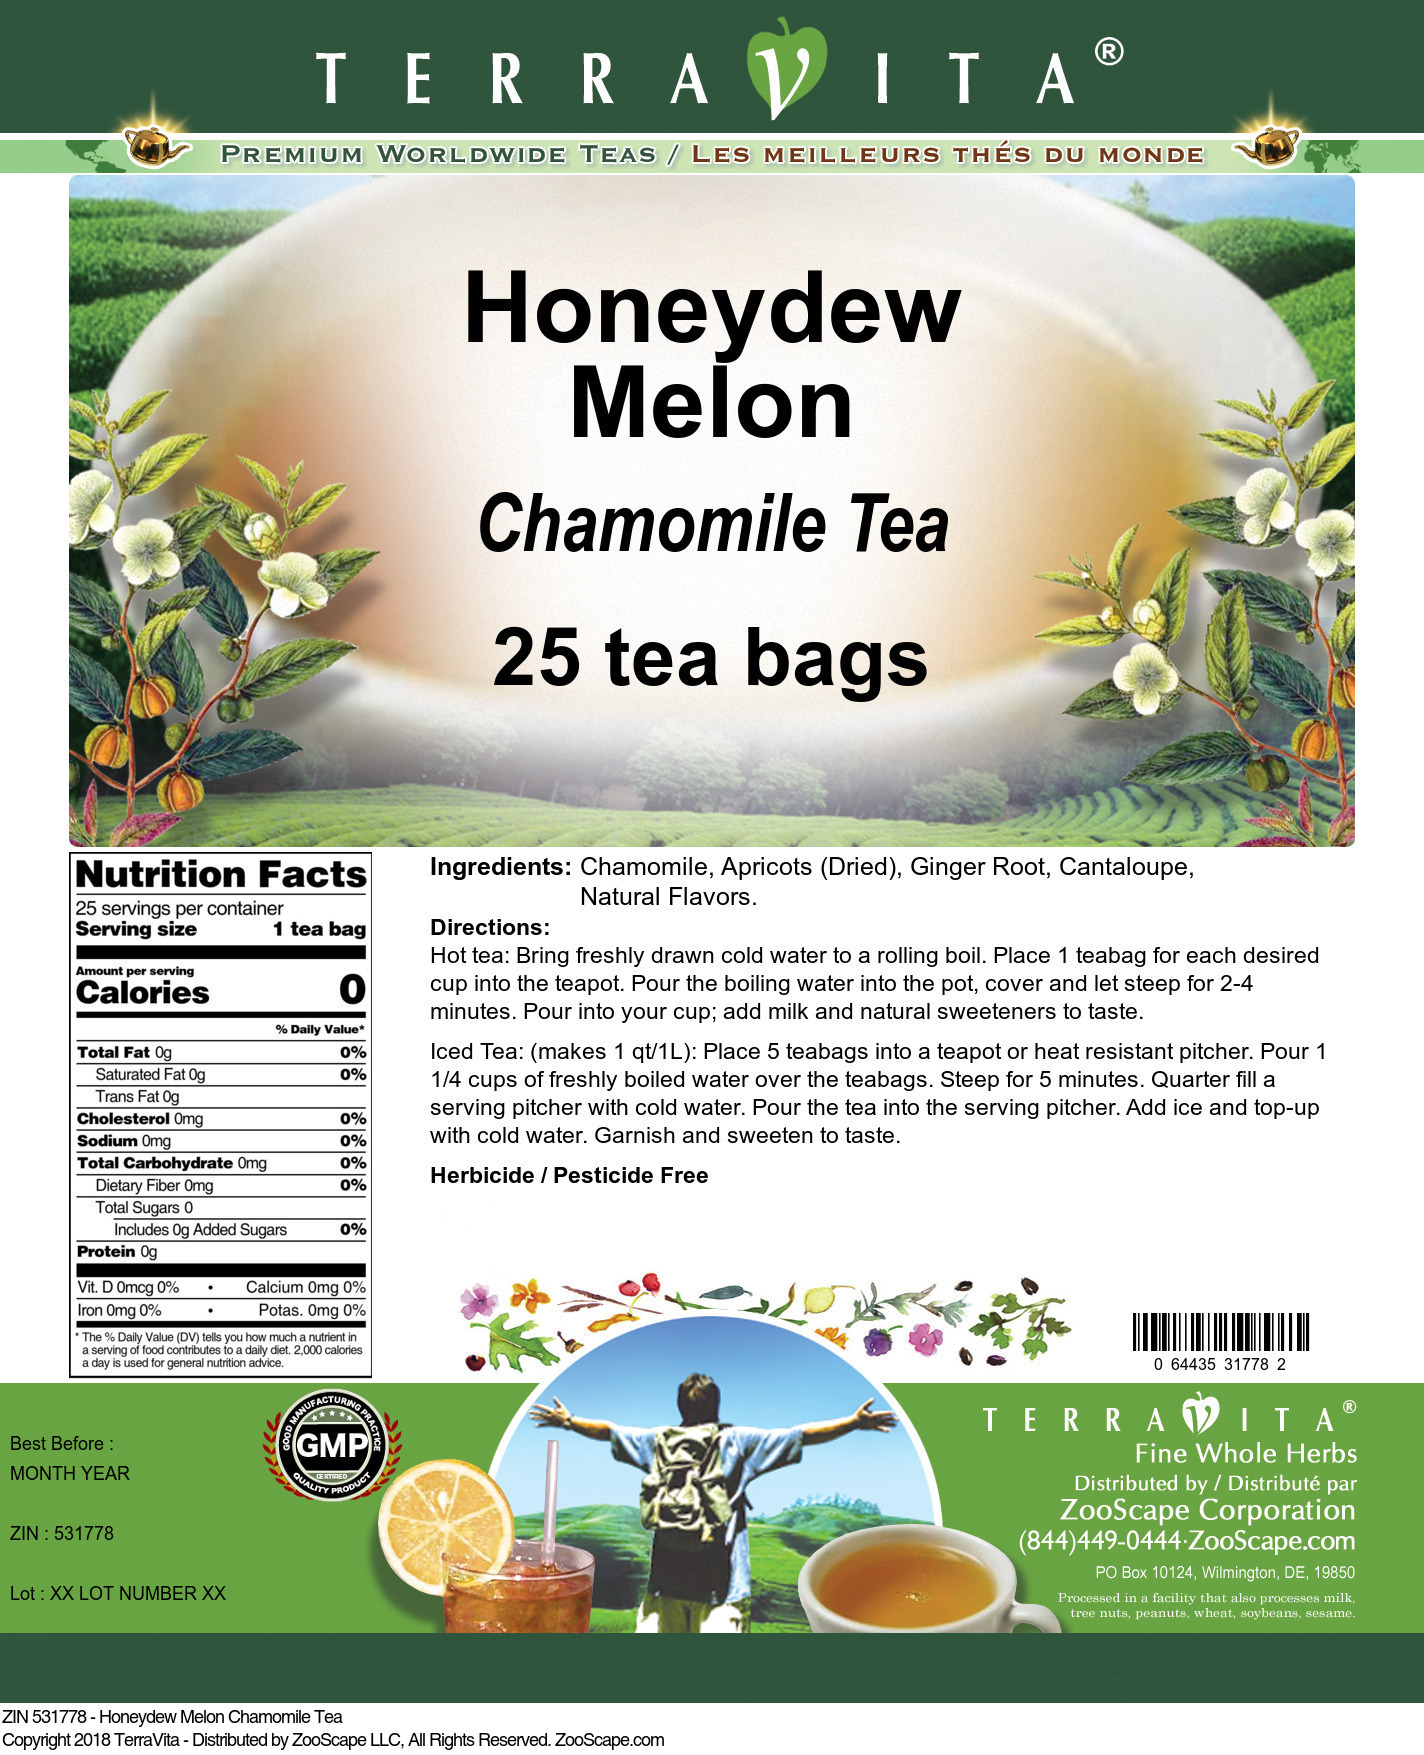 Honeydew Melon Chamomile Tea